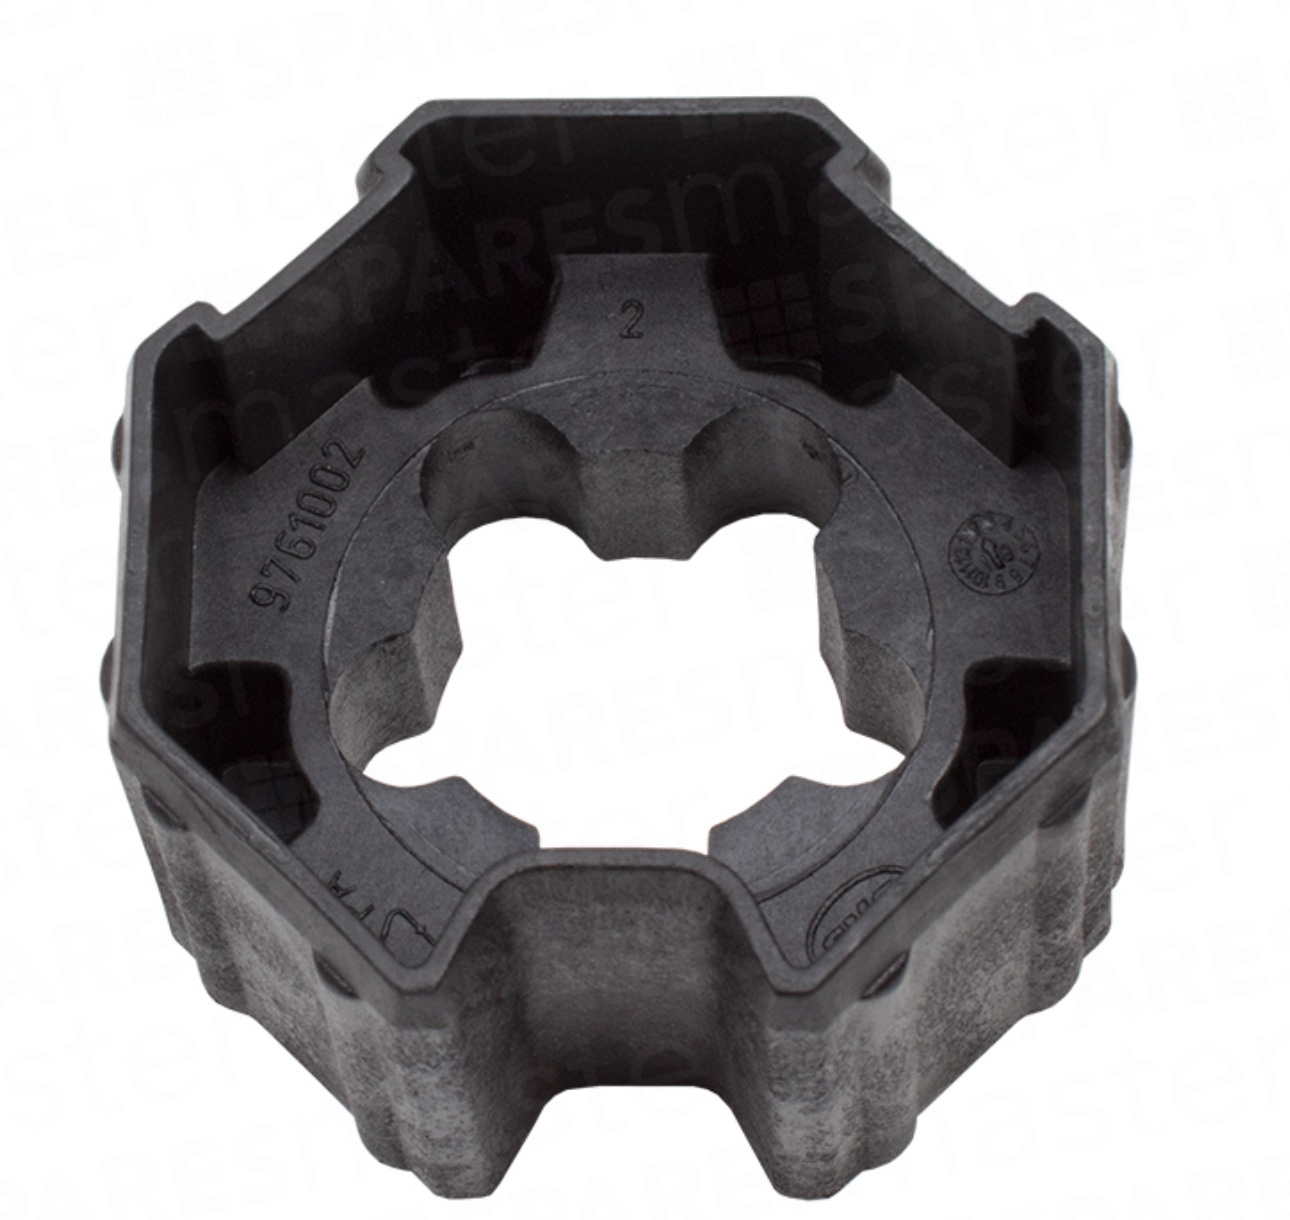 Somfy Tubular Roller Shutter Motor Drive 70mm Octagonal Axle (LT60)